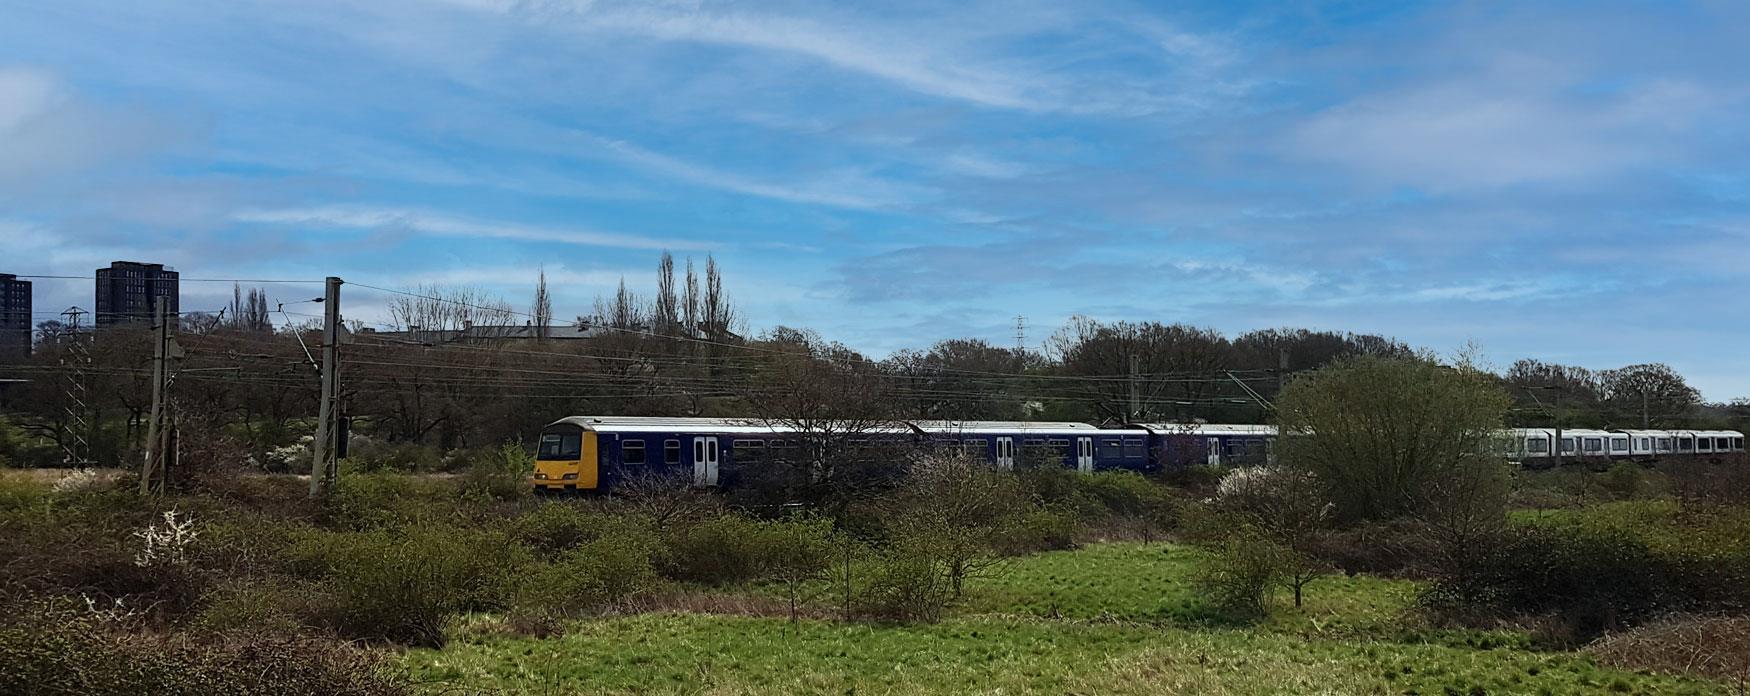 Travelling by rail on Sunshine Coast Line